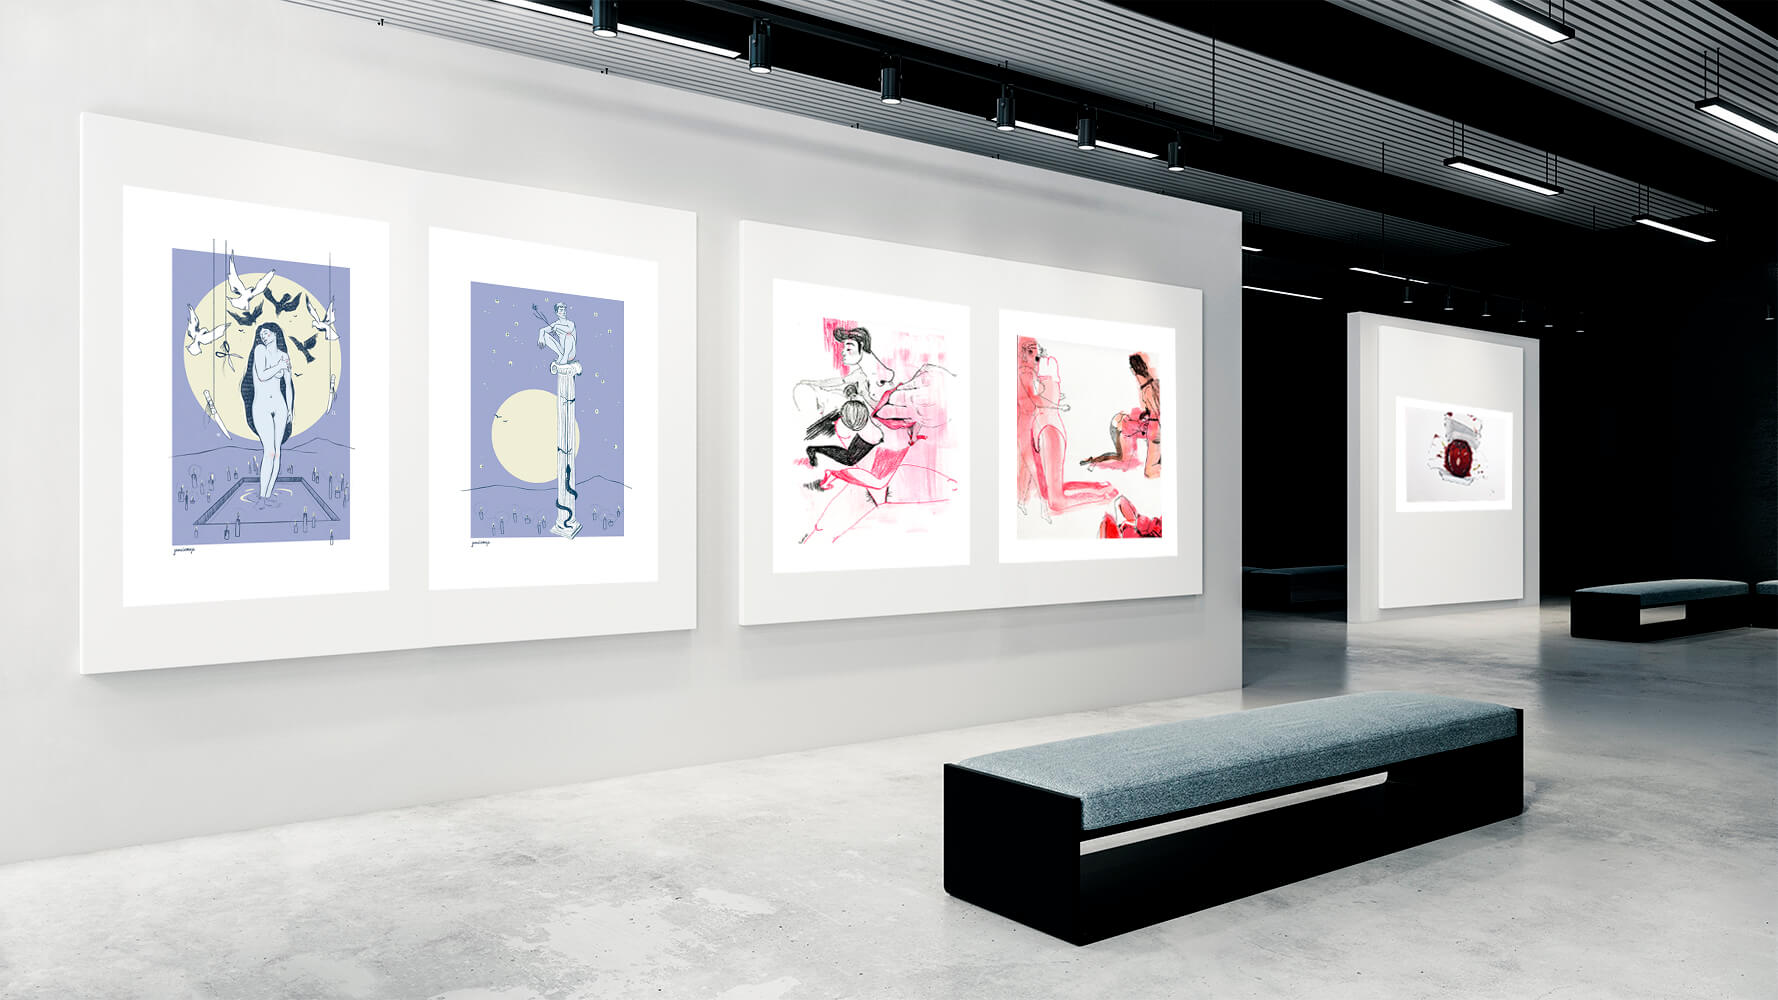 De-peccatis-et-morte-exposicion-colectiva-Horno-Art-Virtual-Galleryl-galeria-arte-ilustracion-decorativa-decoracion-jamalamaja-los-pelos-del-jcoin